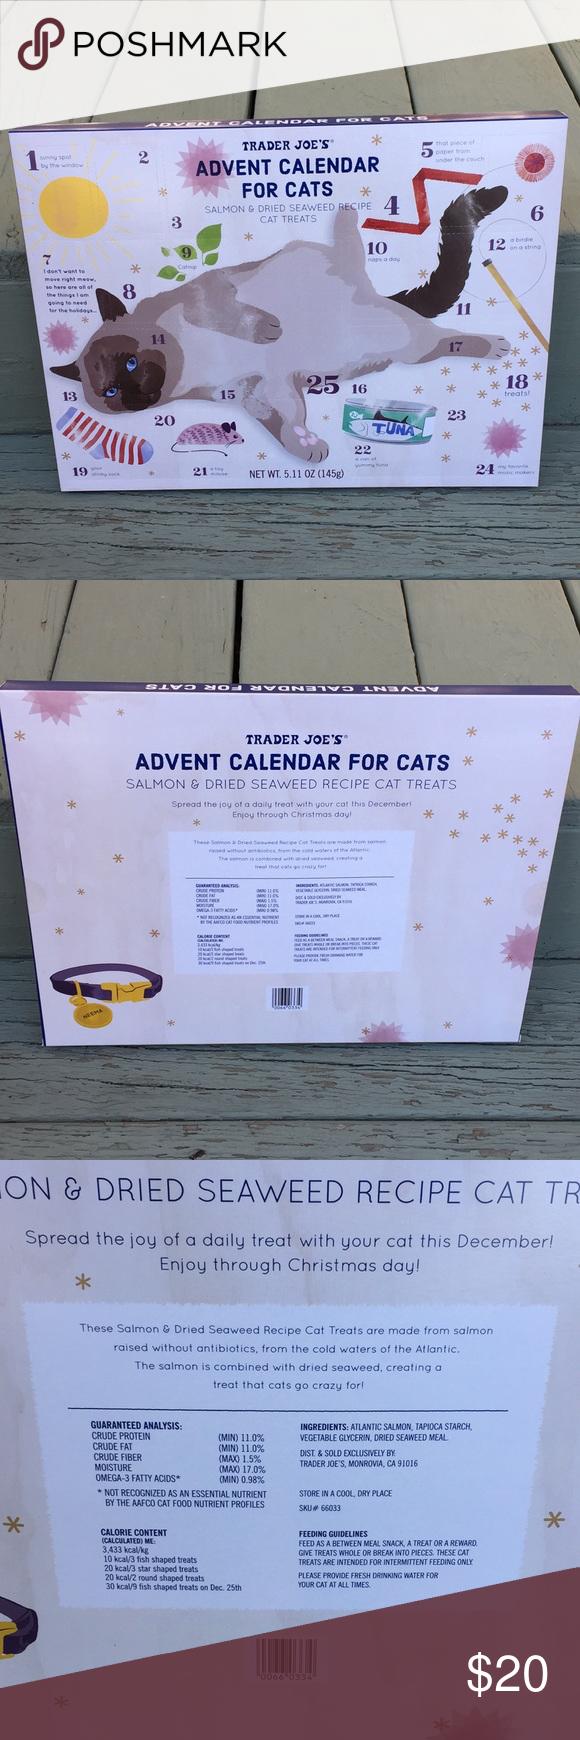 Trader Joe's Advent Calendar for Cats NWT NWT Cat advent